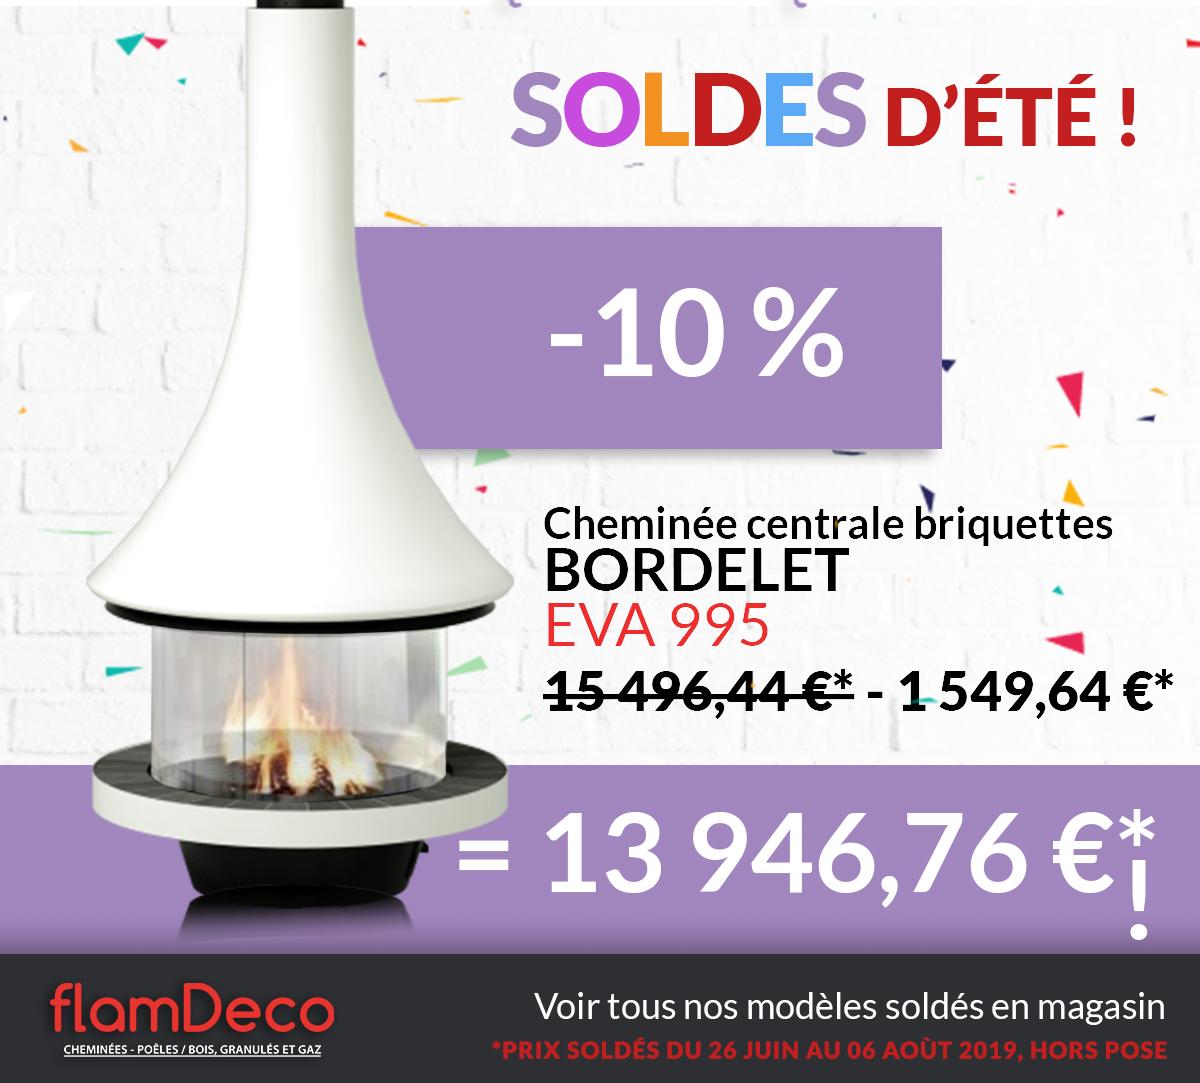 Flamdeco_soldes_poeles_cheminees_laval_mayenne_53_BORDELET_eva995